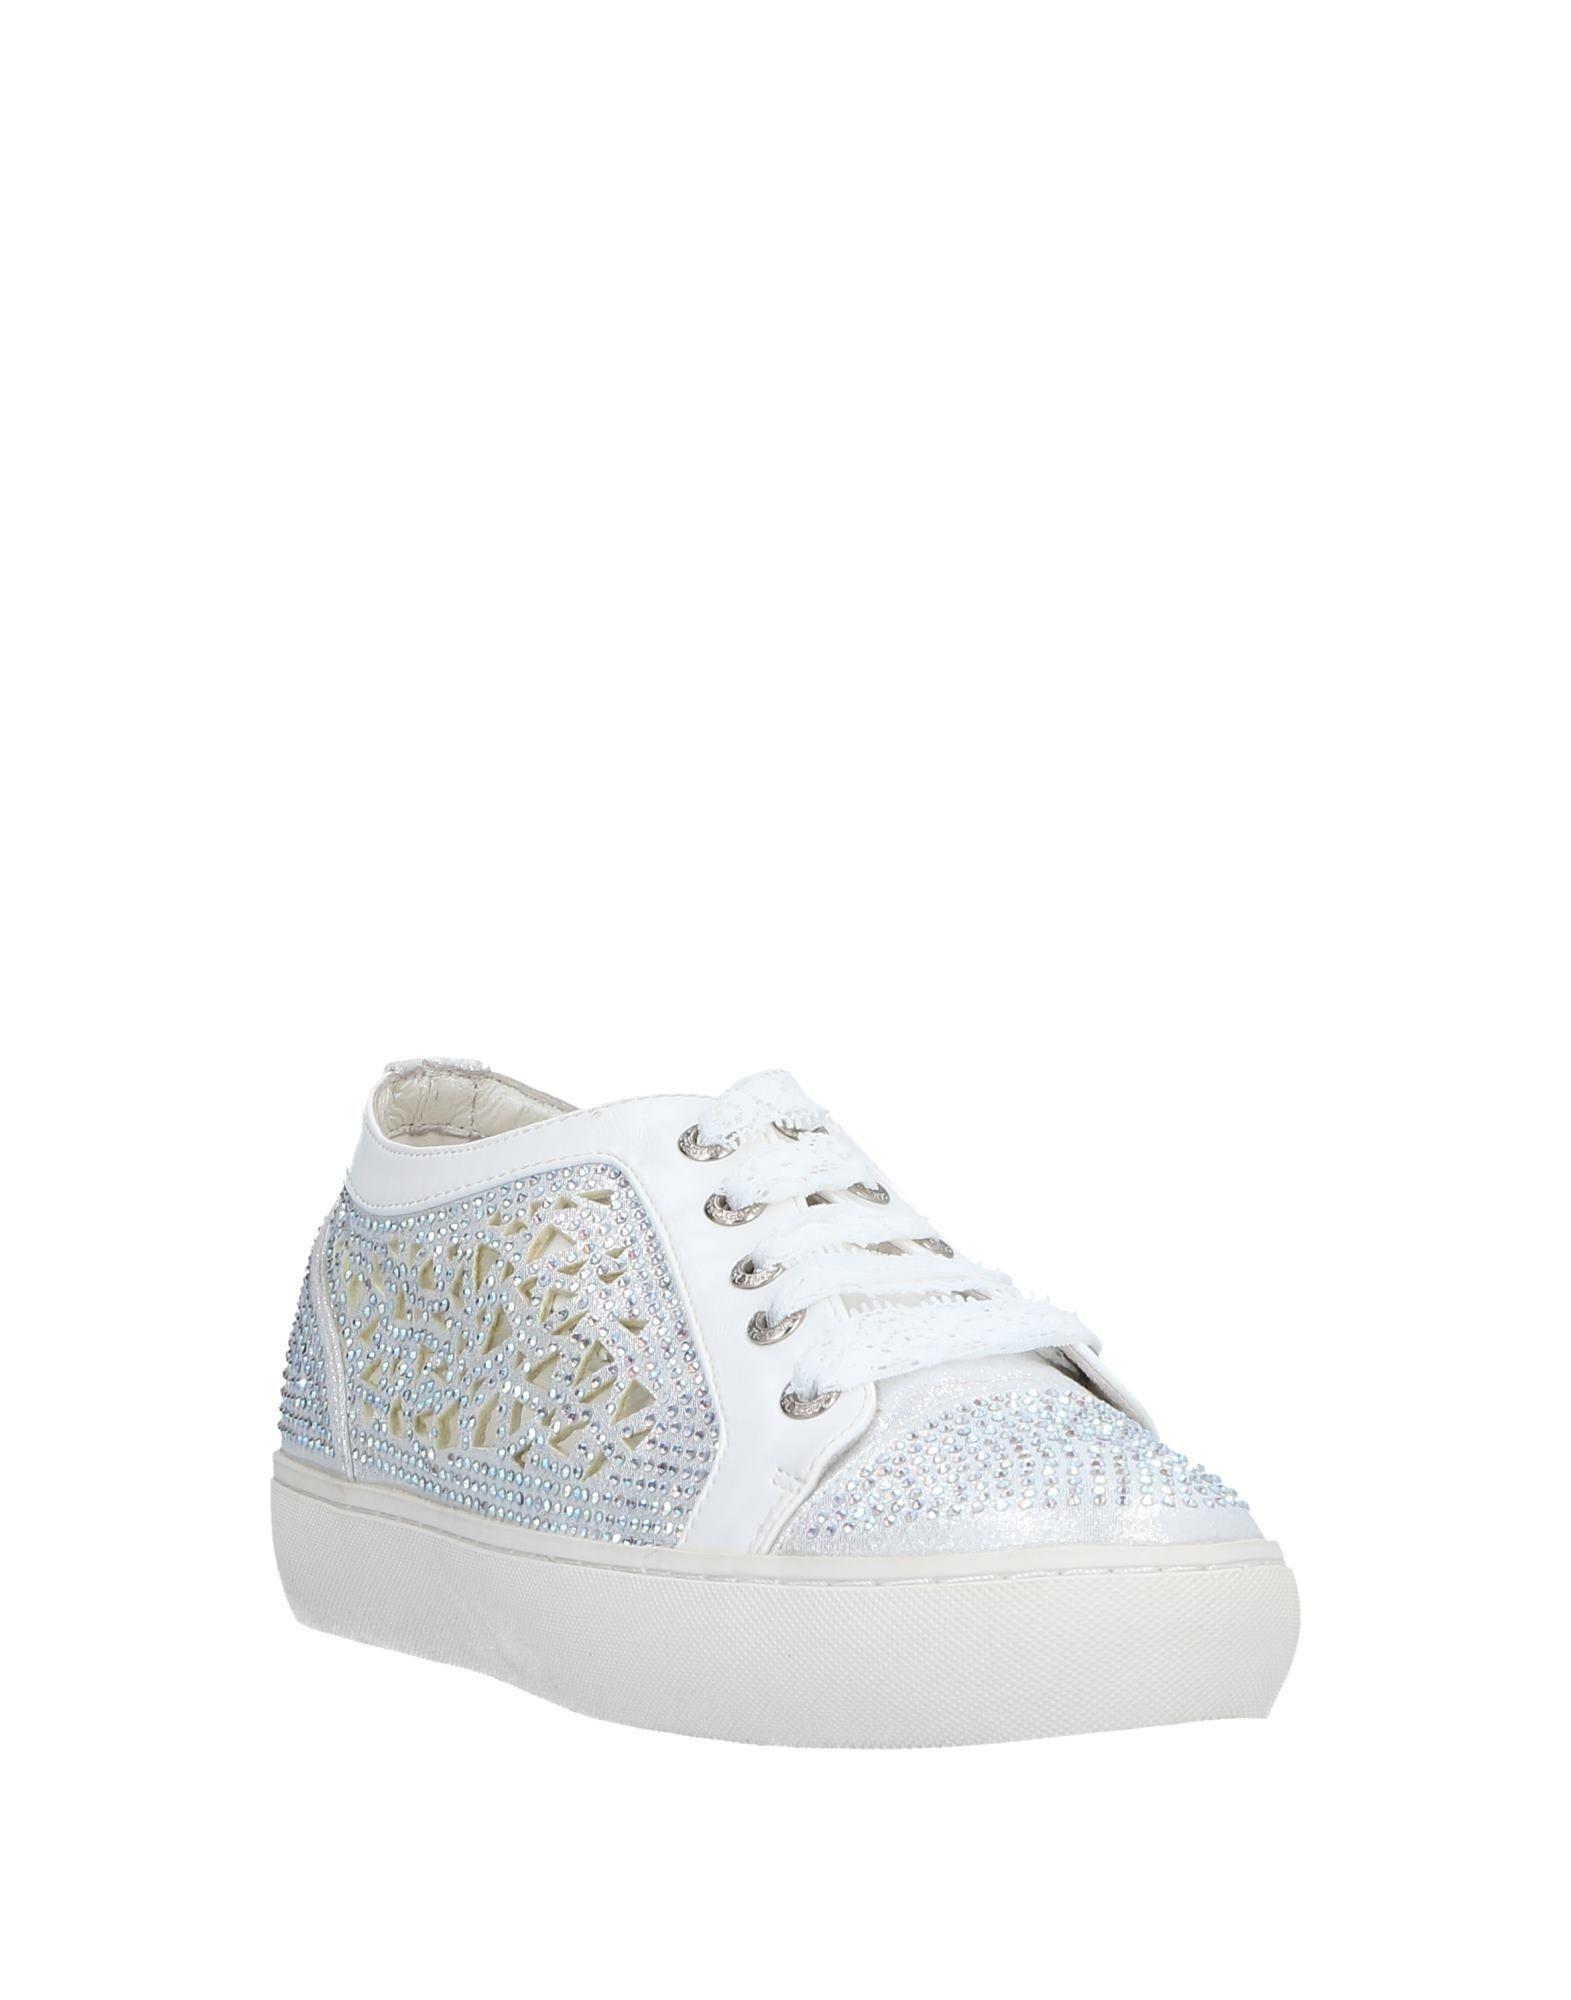 Sneakers Sneakers Sneakers Sara López Donna - 11209563TI 4bba5a